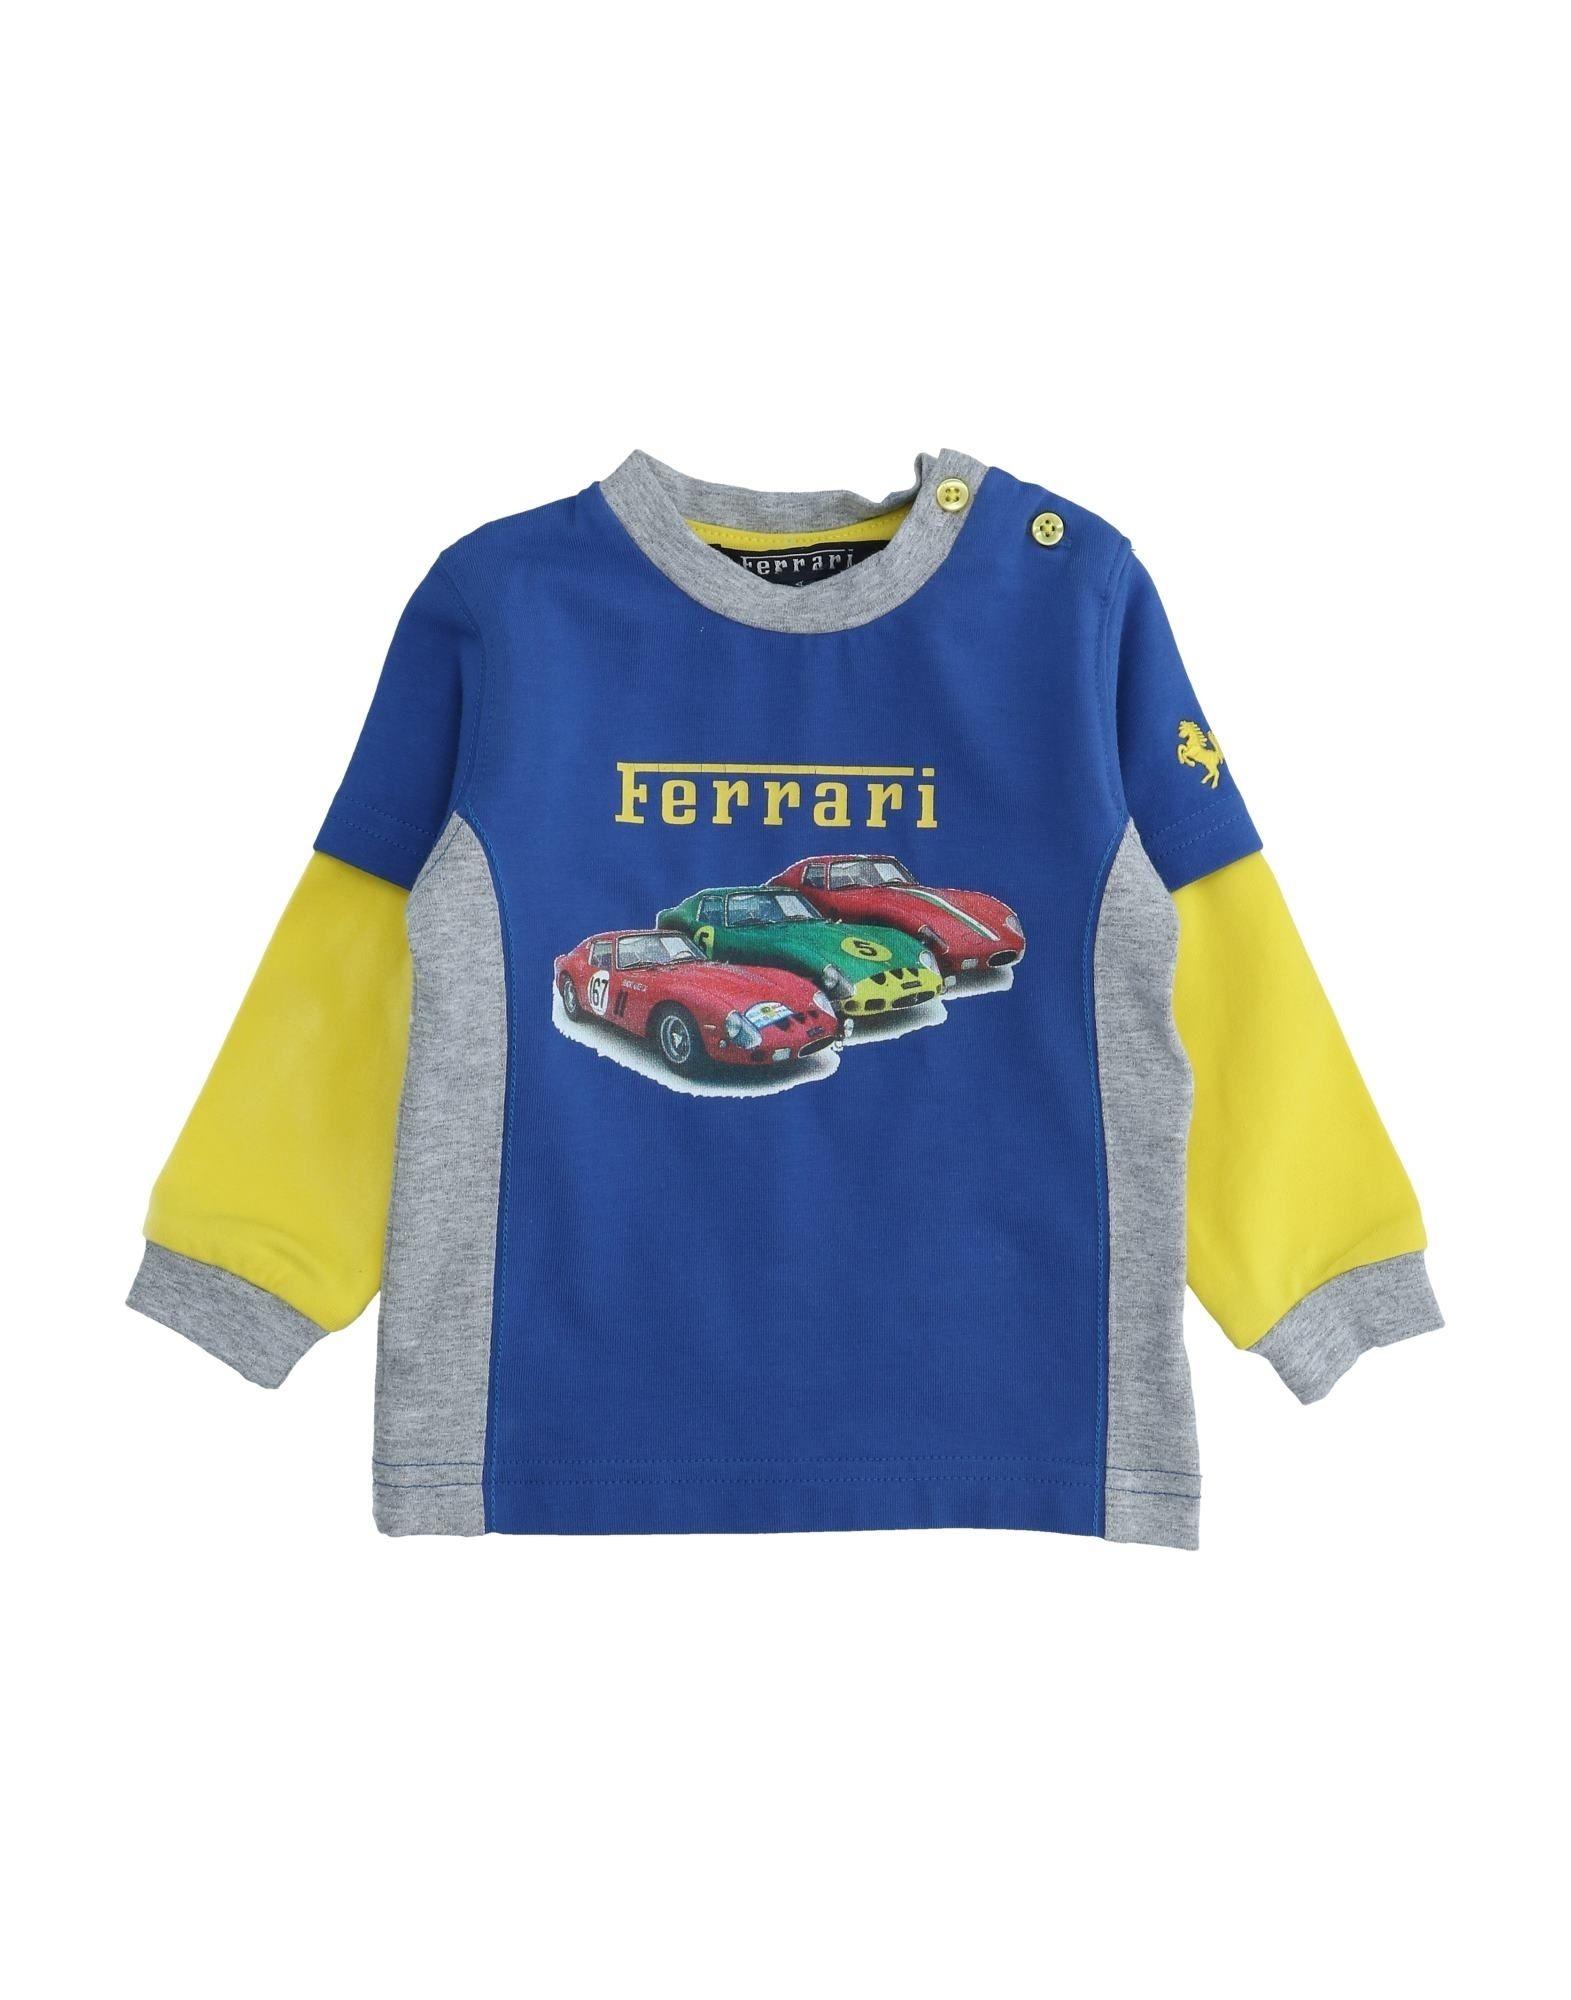 Ferrari Kids' T-shirts In Blue